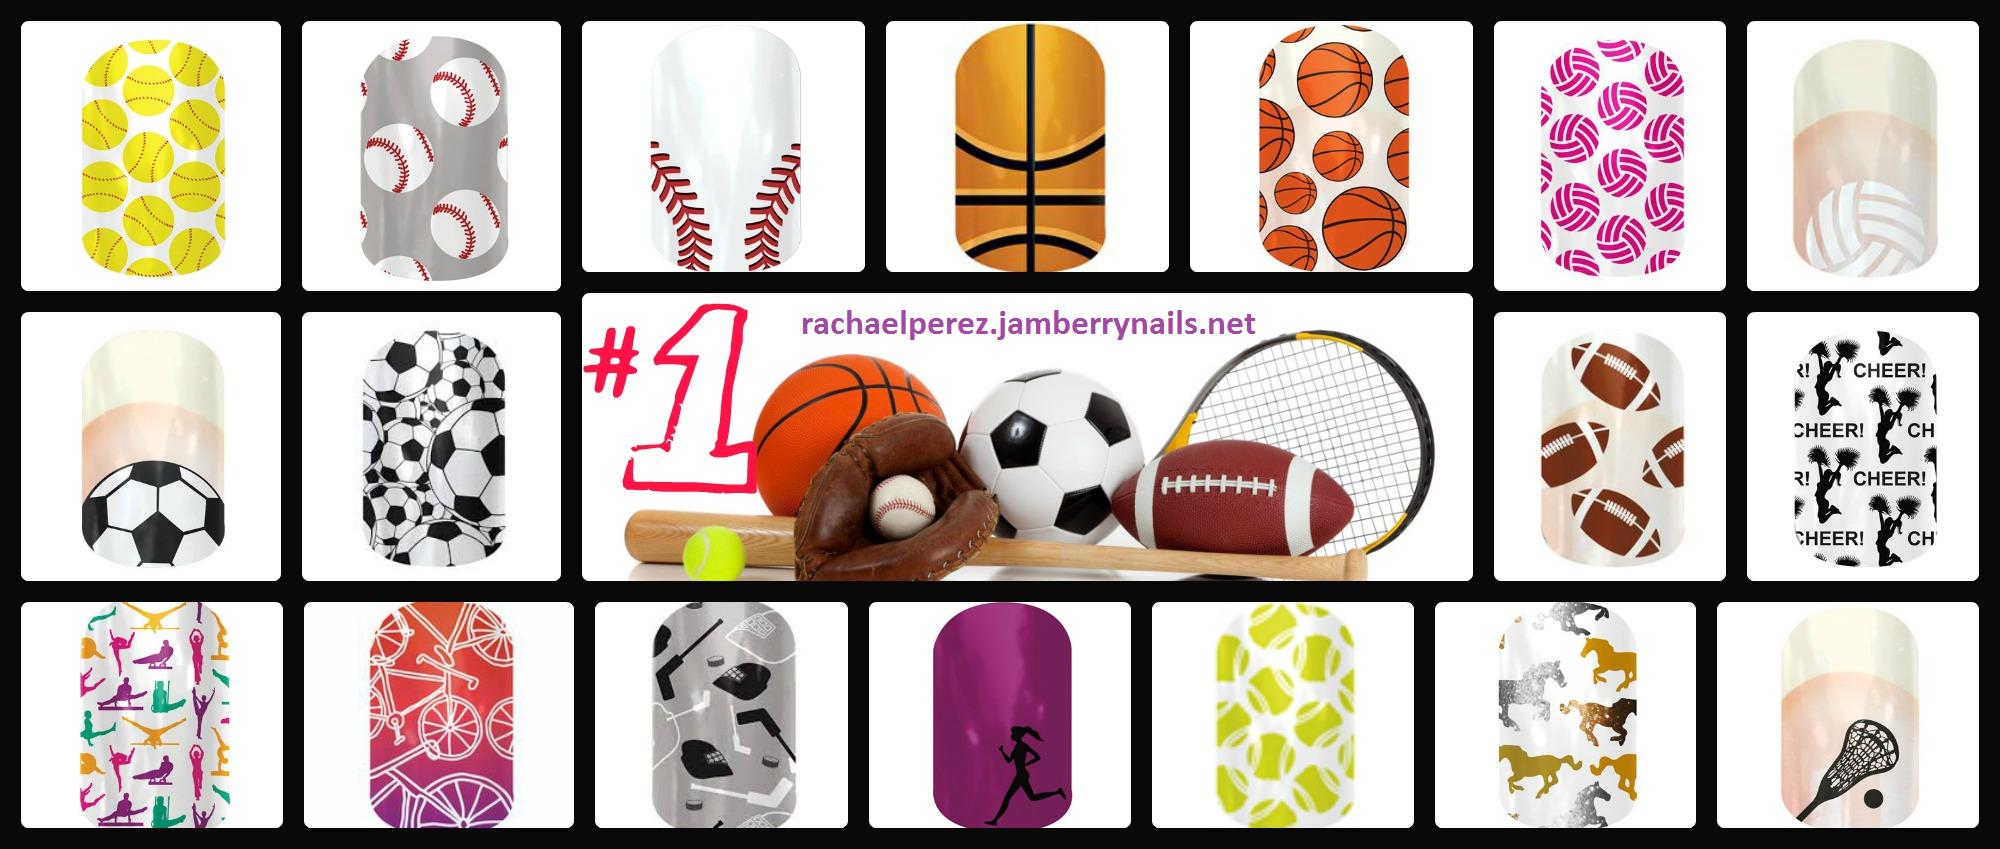 Sports Jamberry Nails. Buy 3 sheets get one FREE!!! rachaelperez.jamberrynails.net